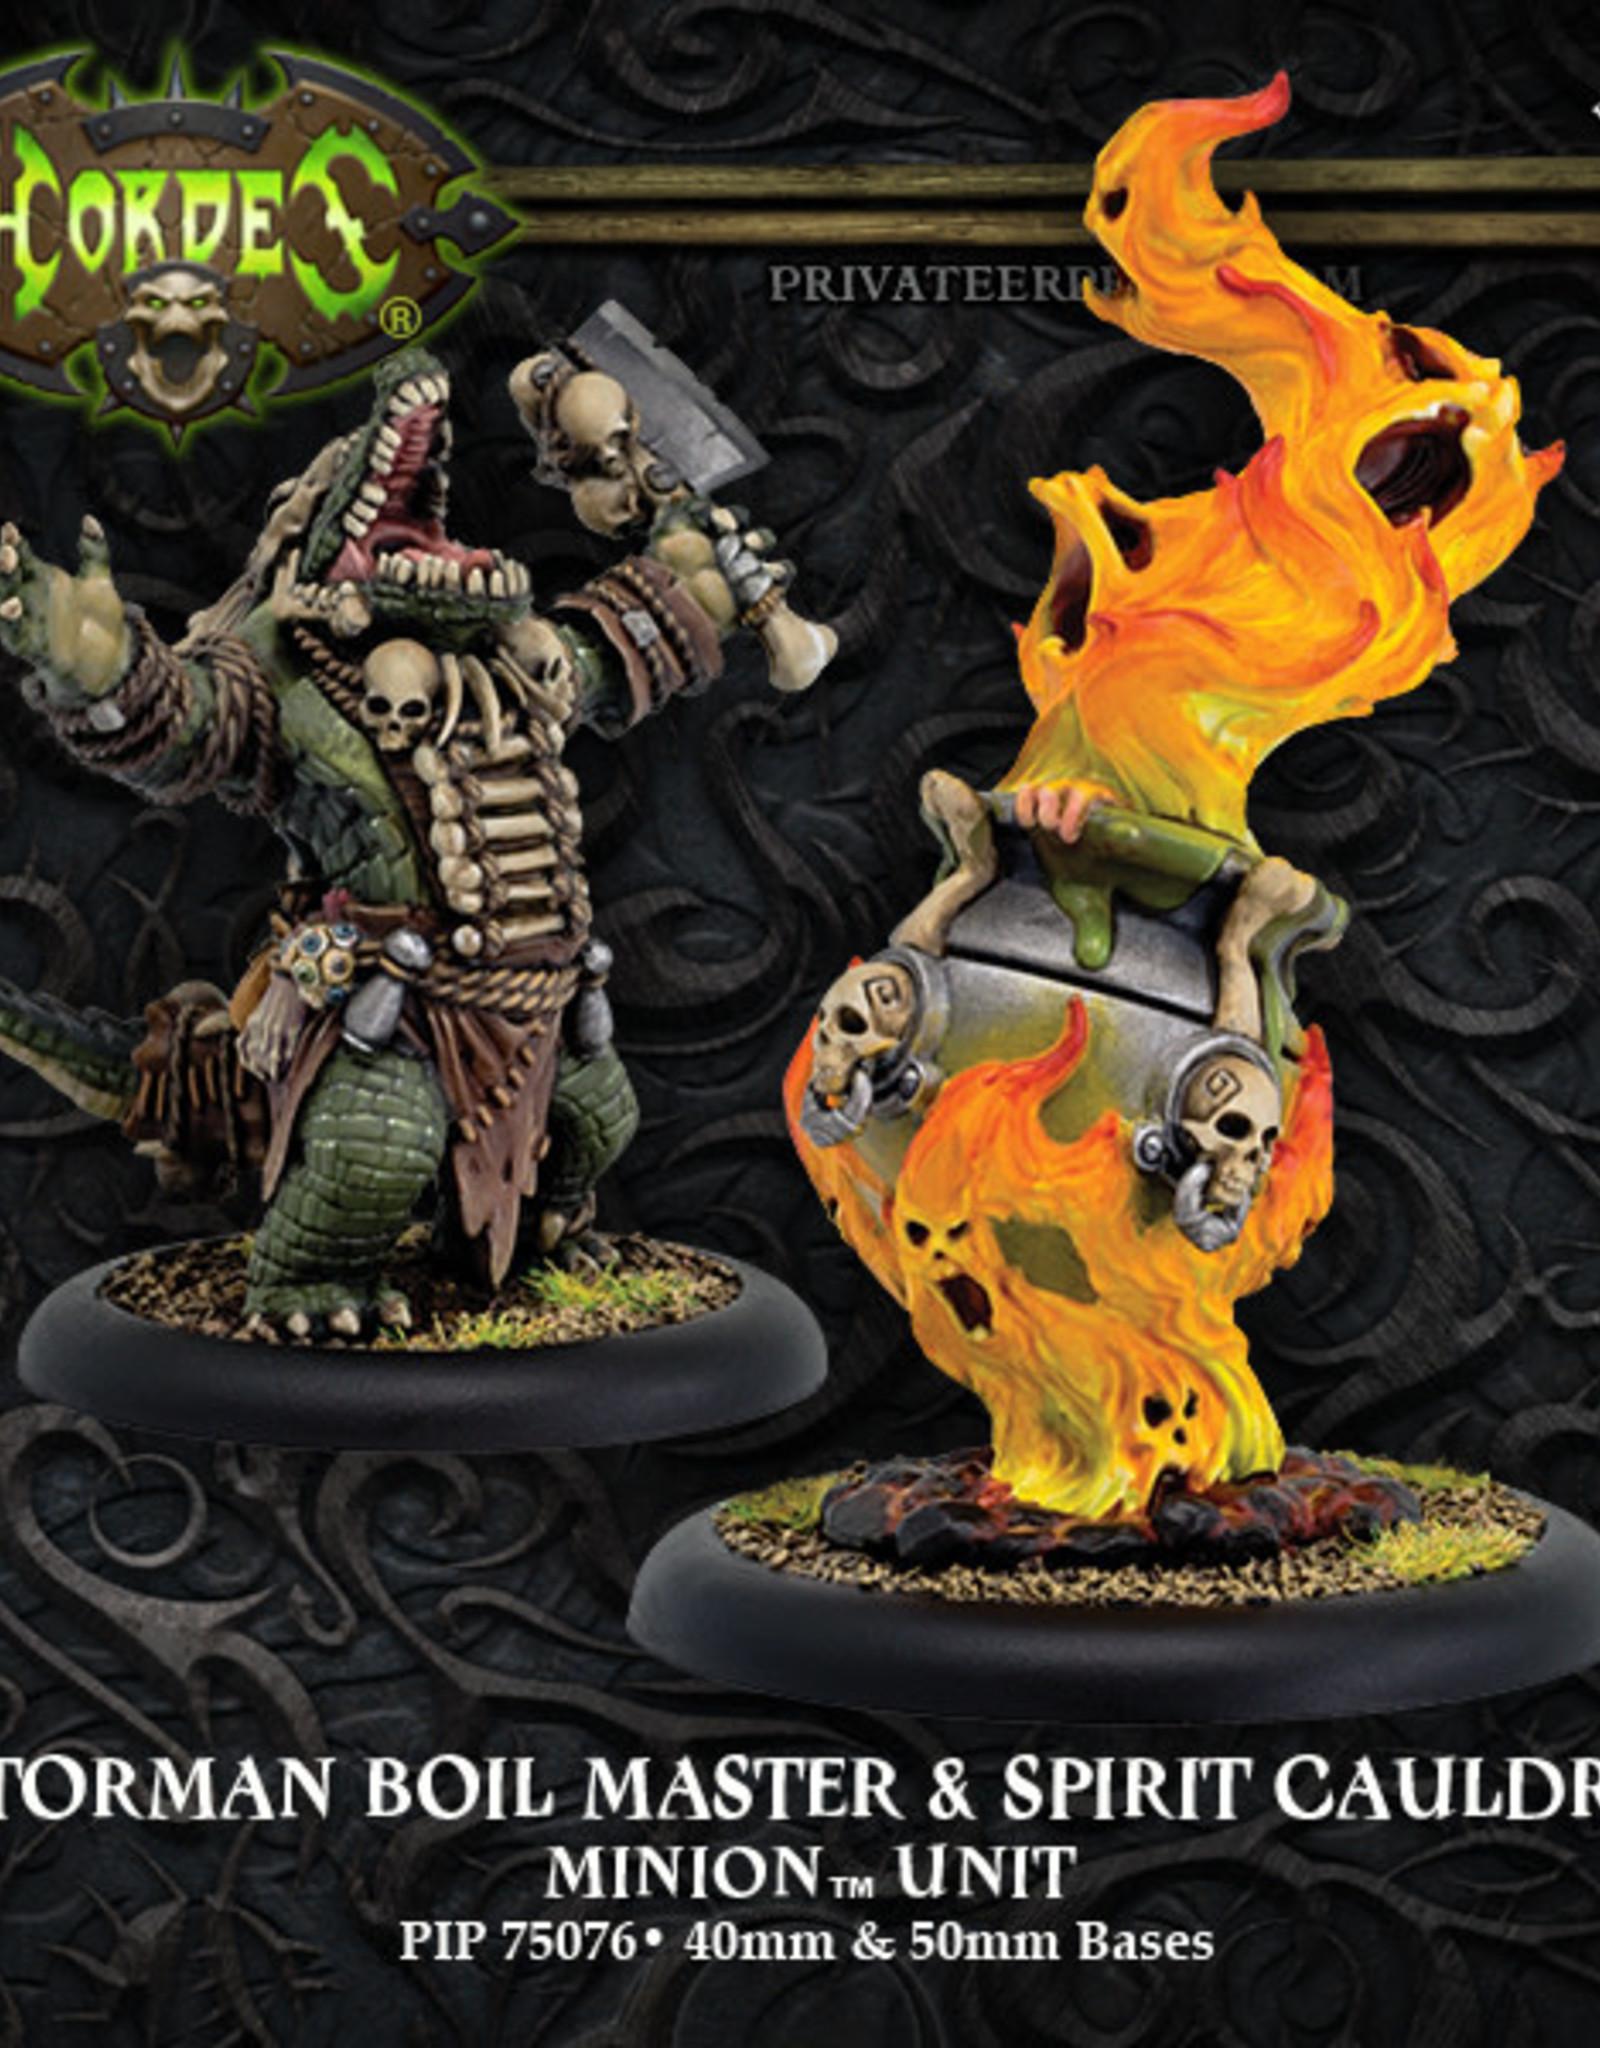 Hordes Minions - Gatorman Boil Master & Spirit Cauldron